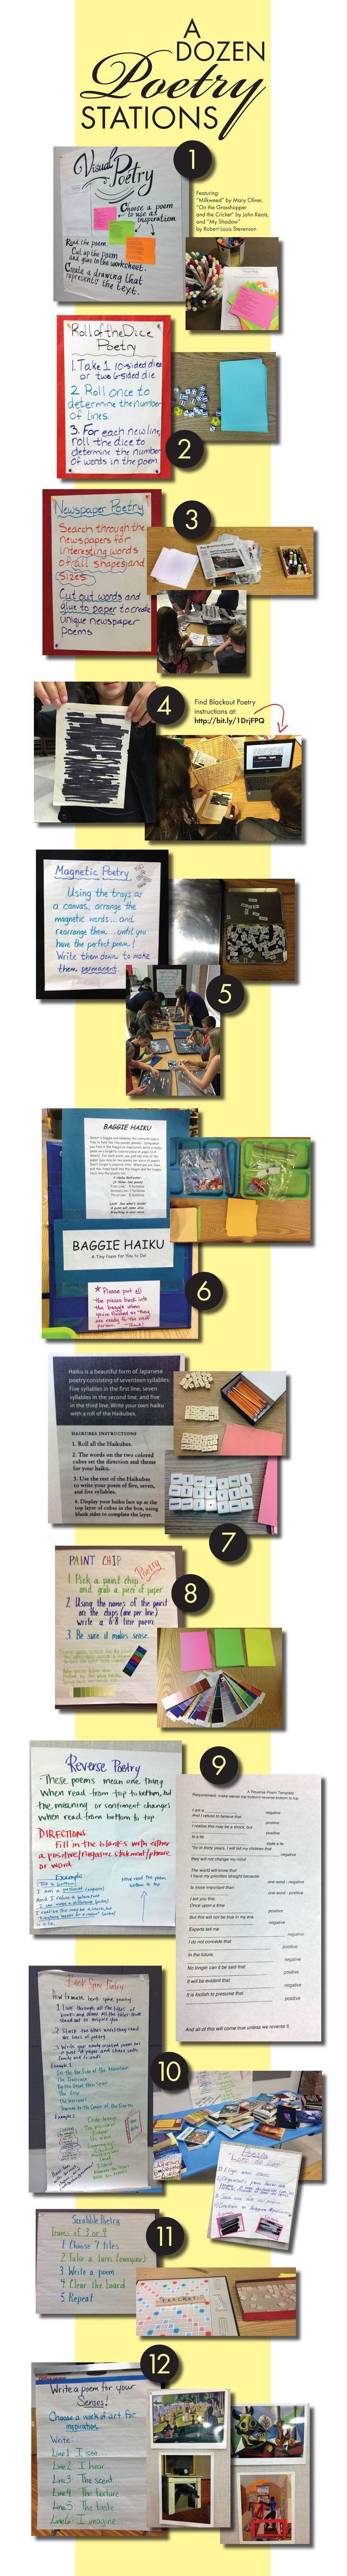 FREE poetry station ideas. laurarandazzo.com #highschoolEnglish #middleschoolEnglish